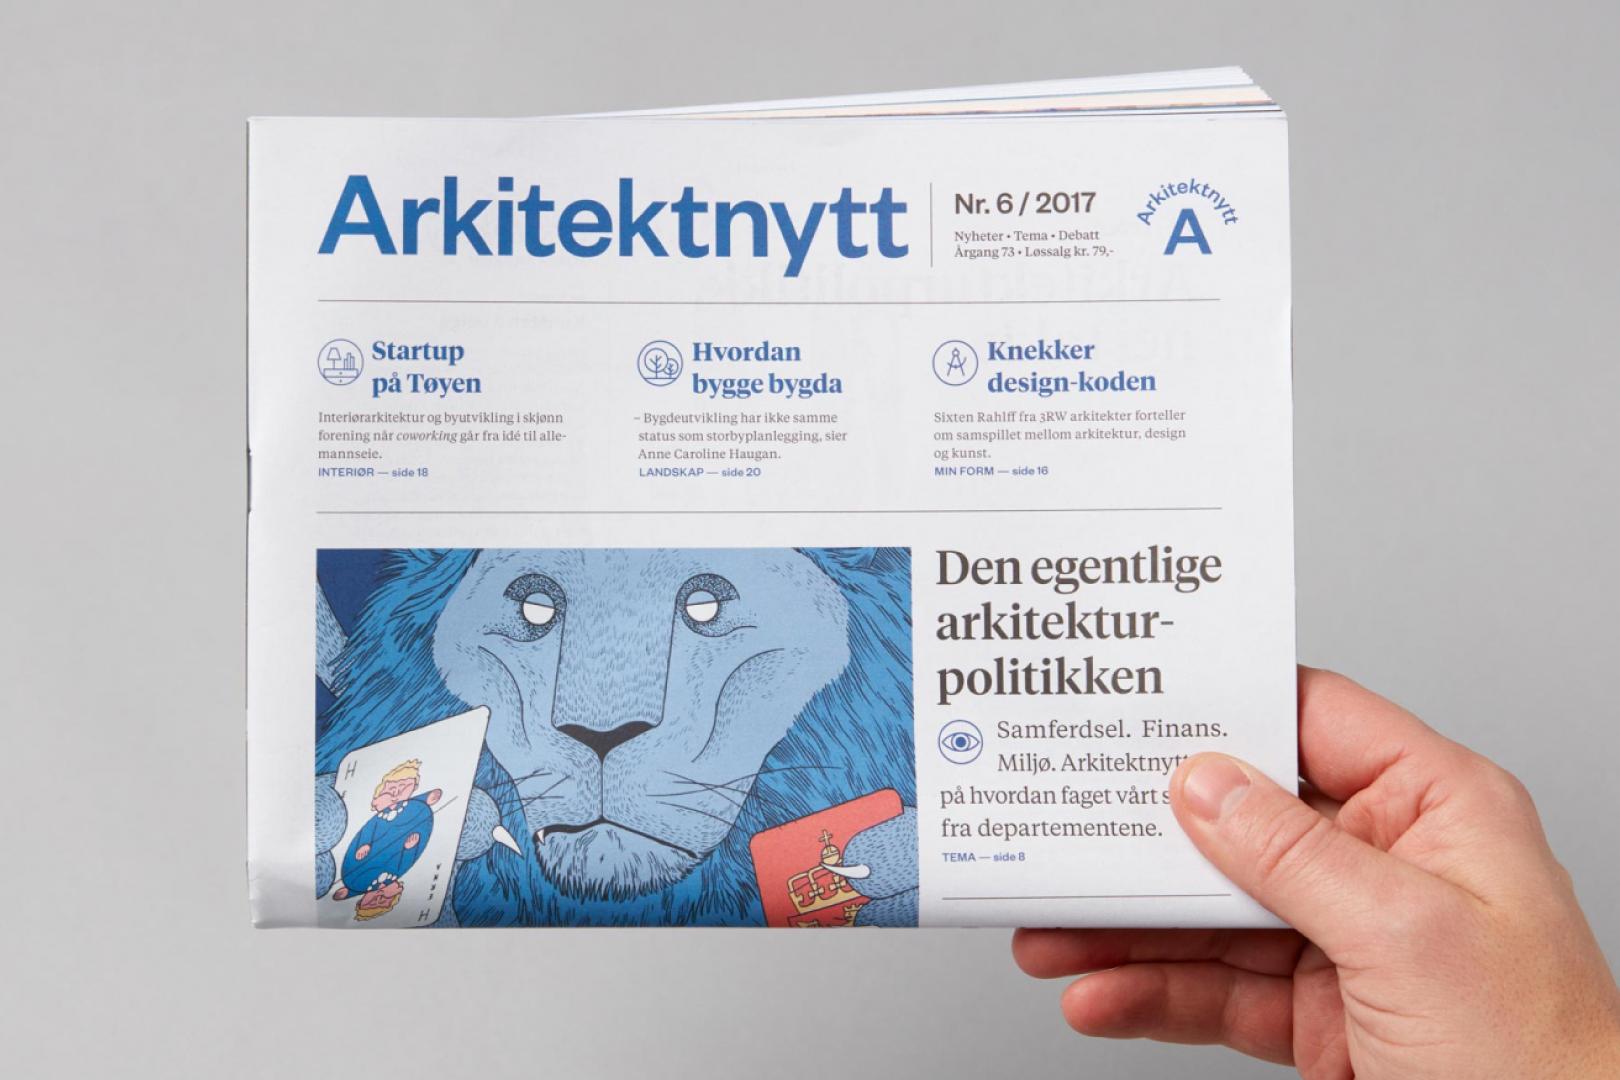 Cover image: Arkitektnytt